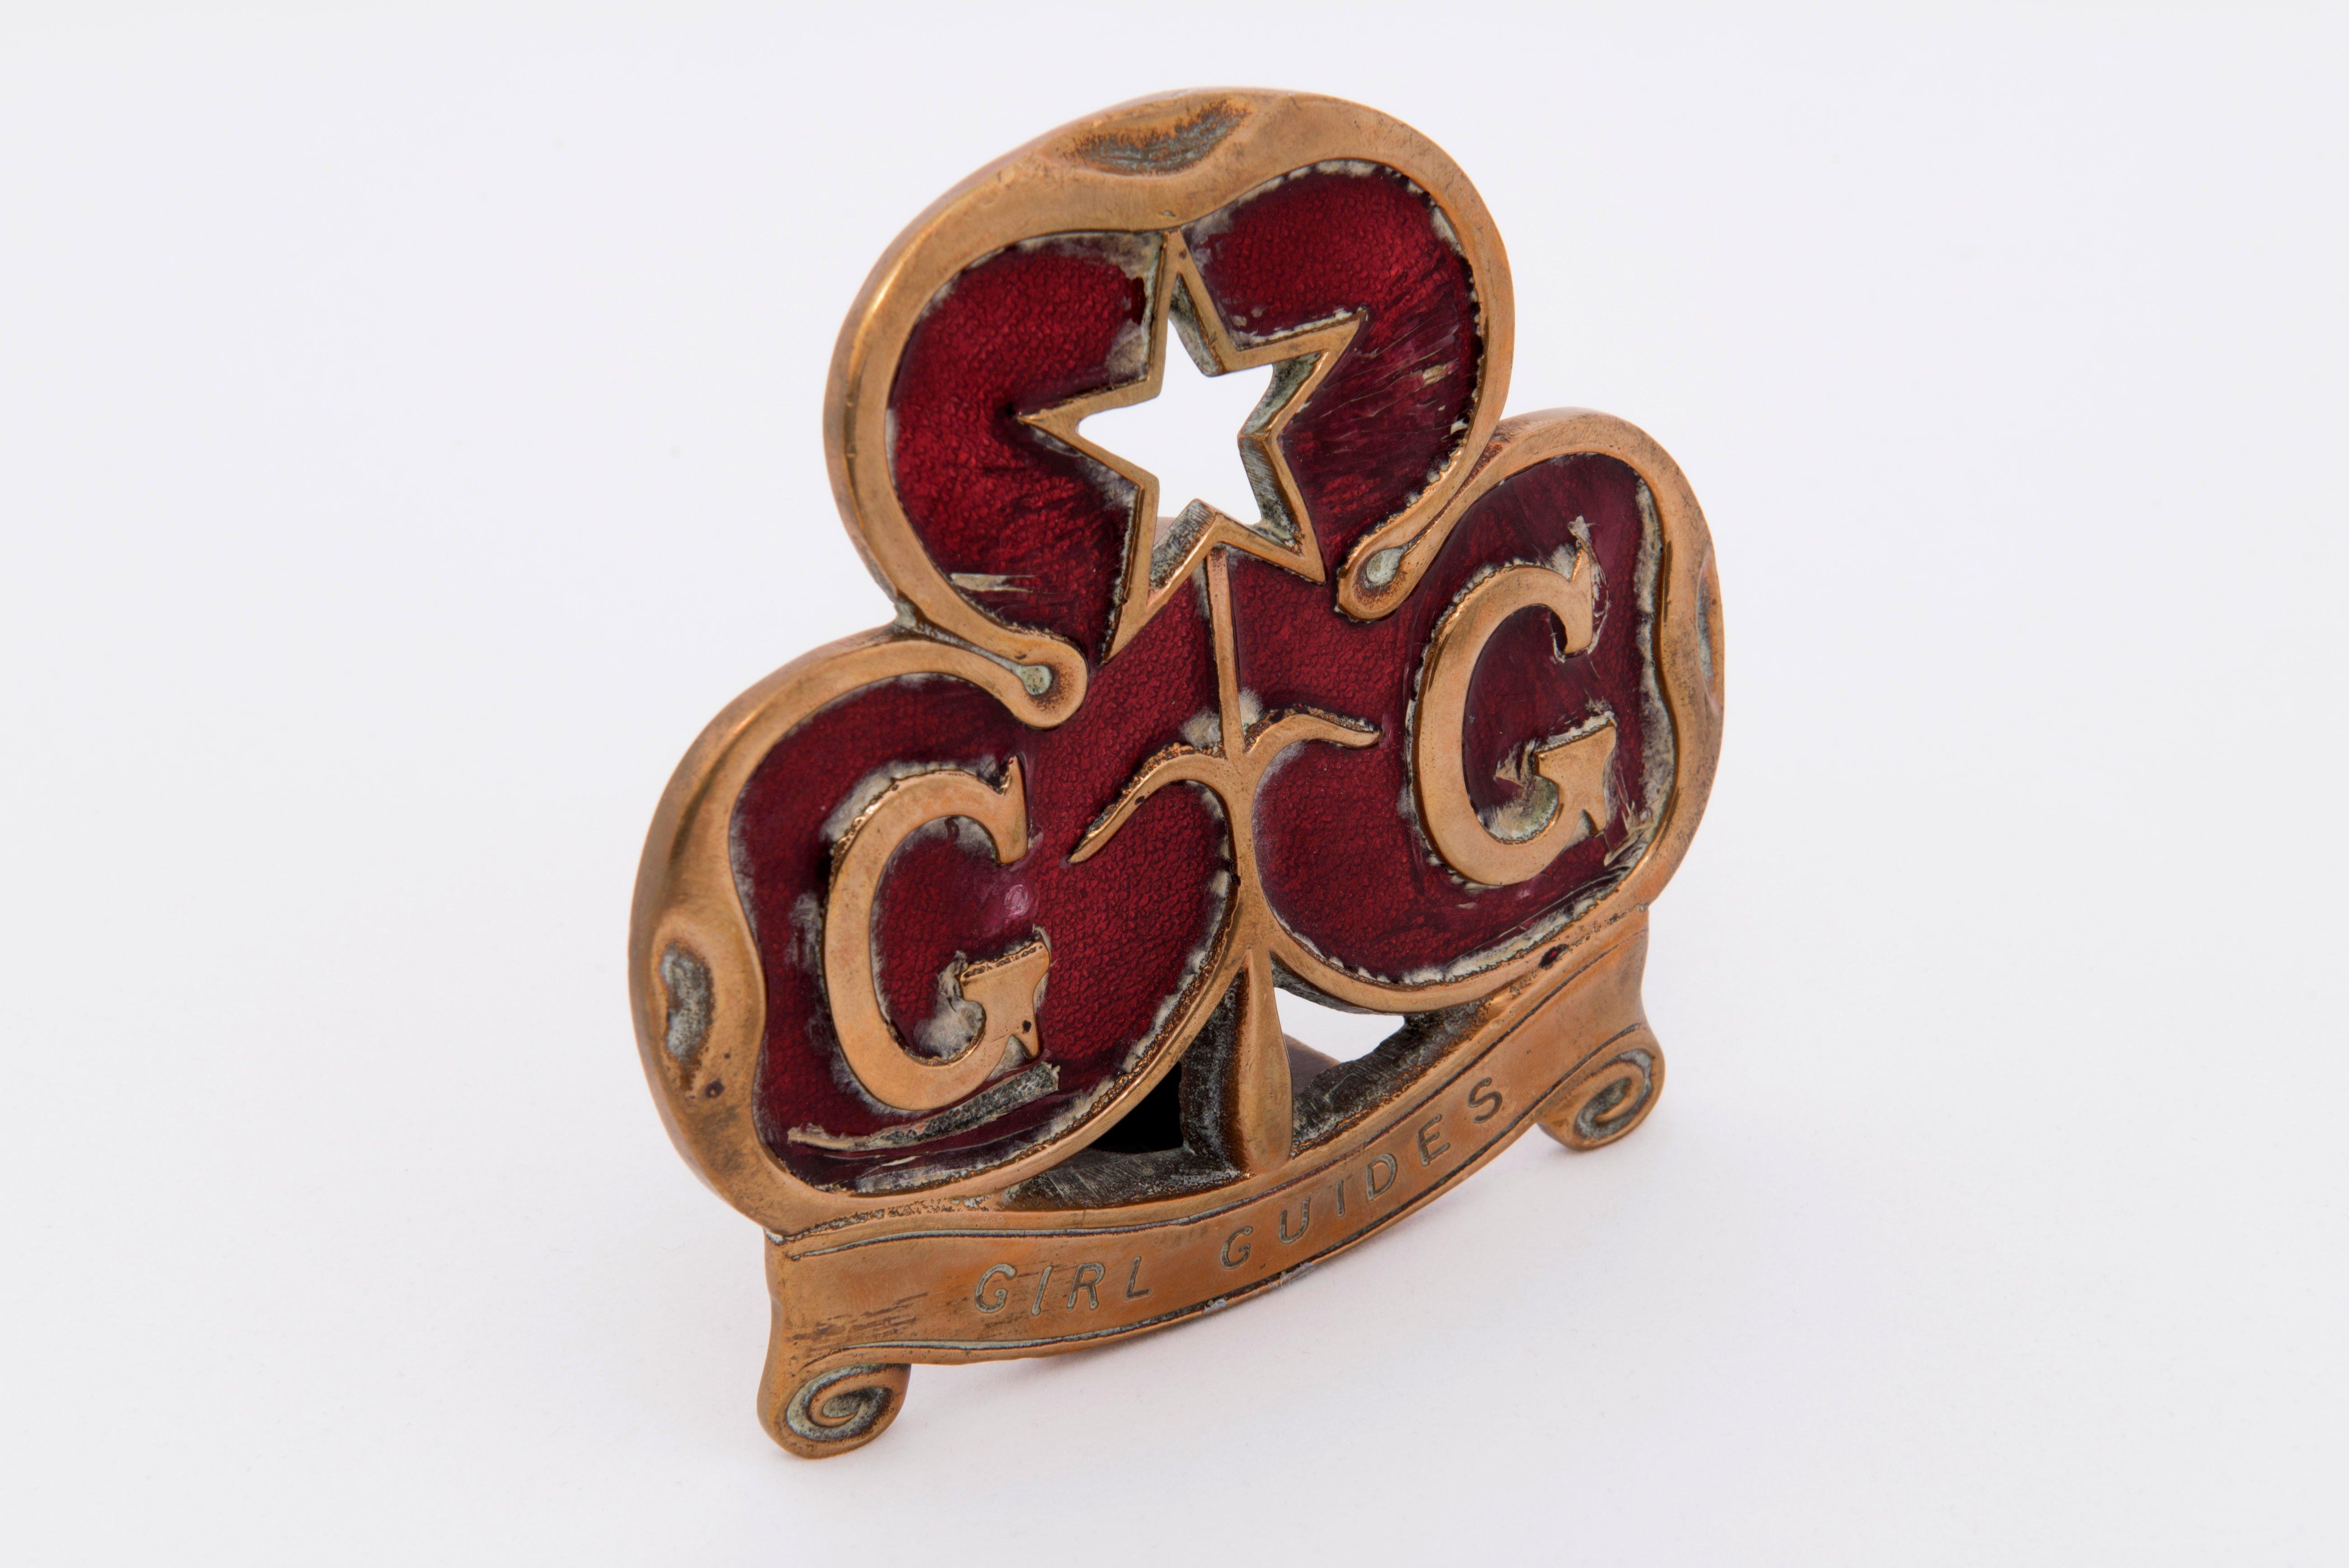 Girl Guide Badge – East Grinstead Museum